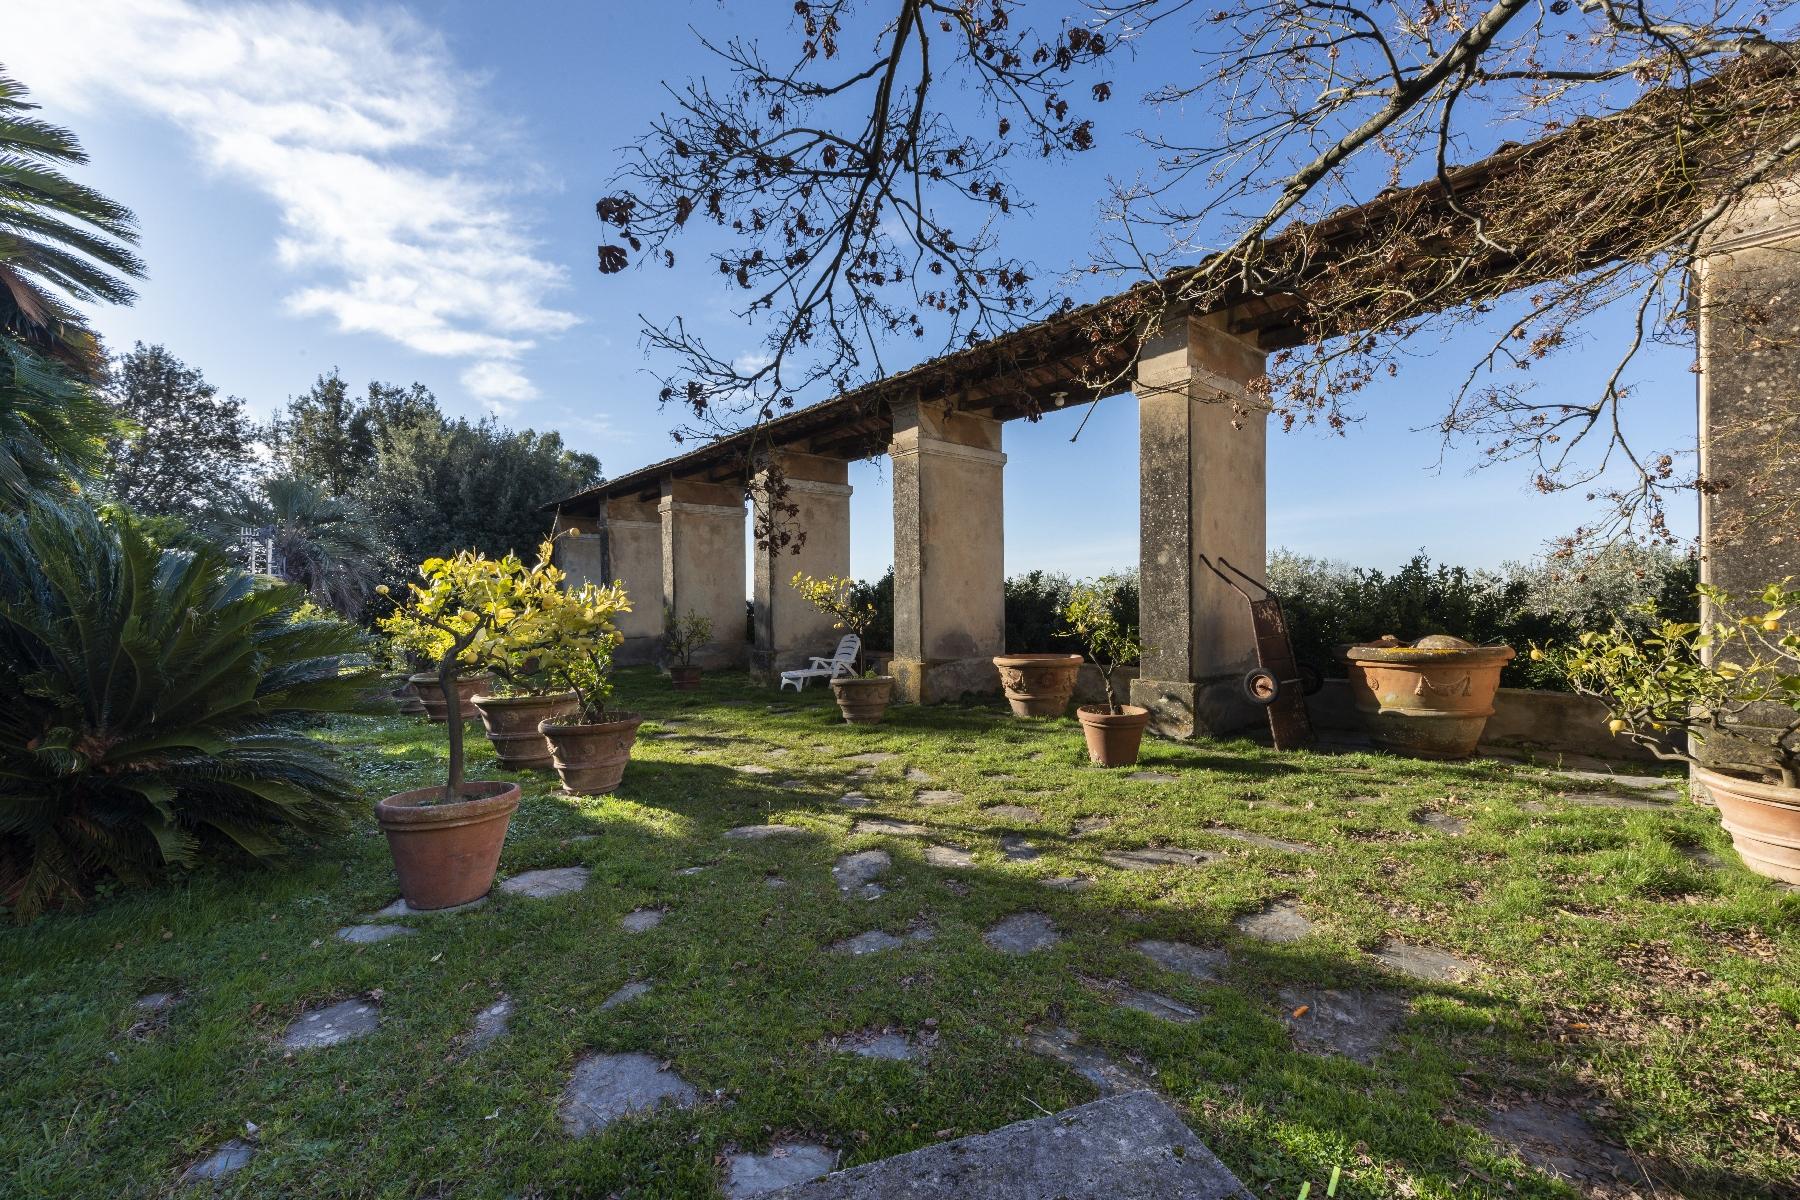 Villa in Vendita a Camaiore: 5 locali, 2800 mq - Foto 16